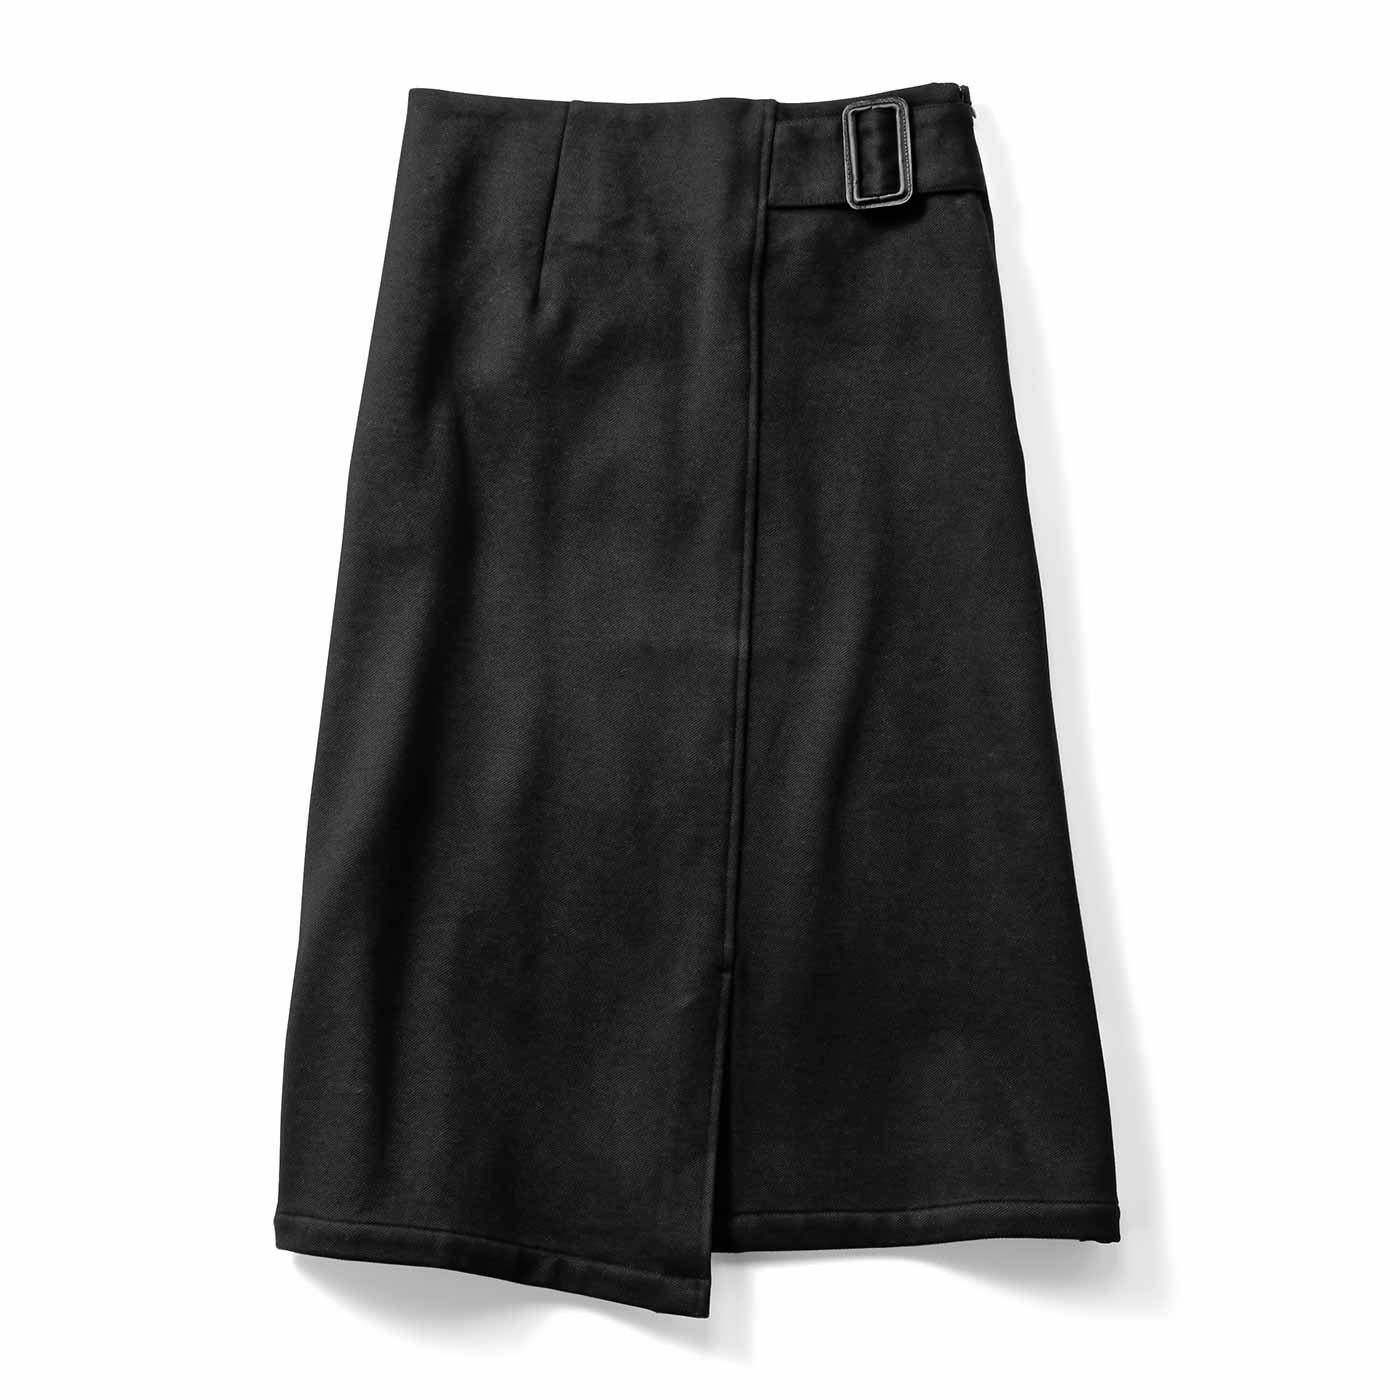 IEDIT[イディット] 裏起毛であったか 伸びやかな着心地のストレッチスカート〈ブラック〉